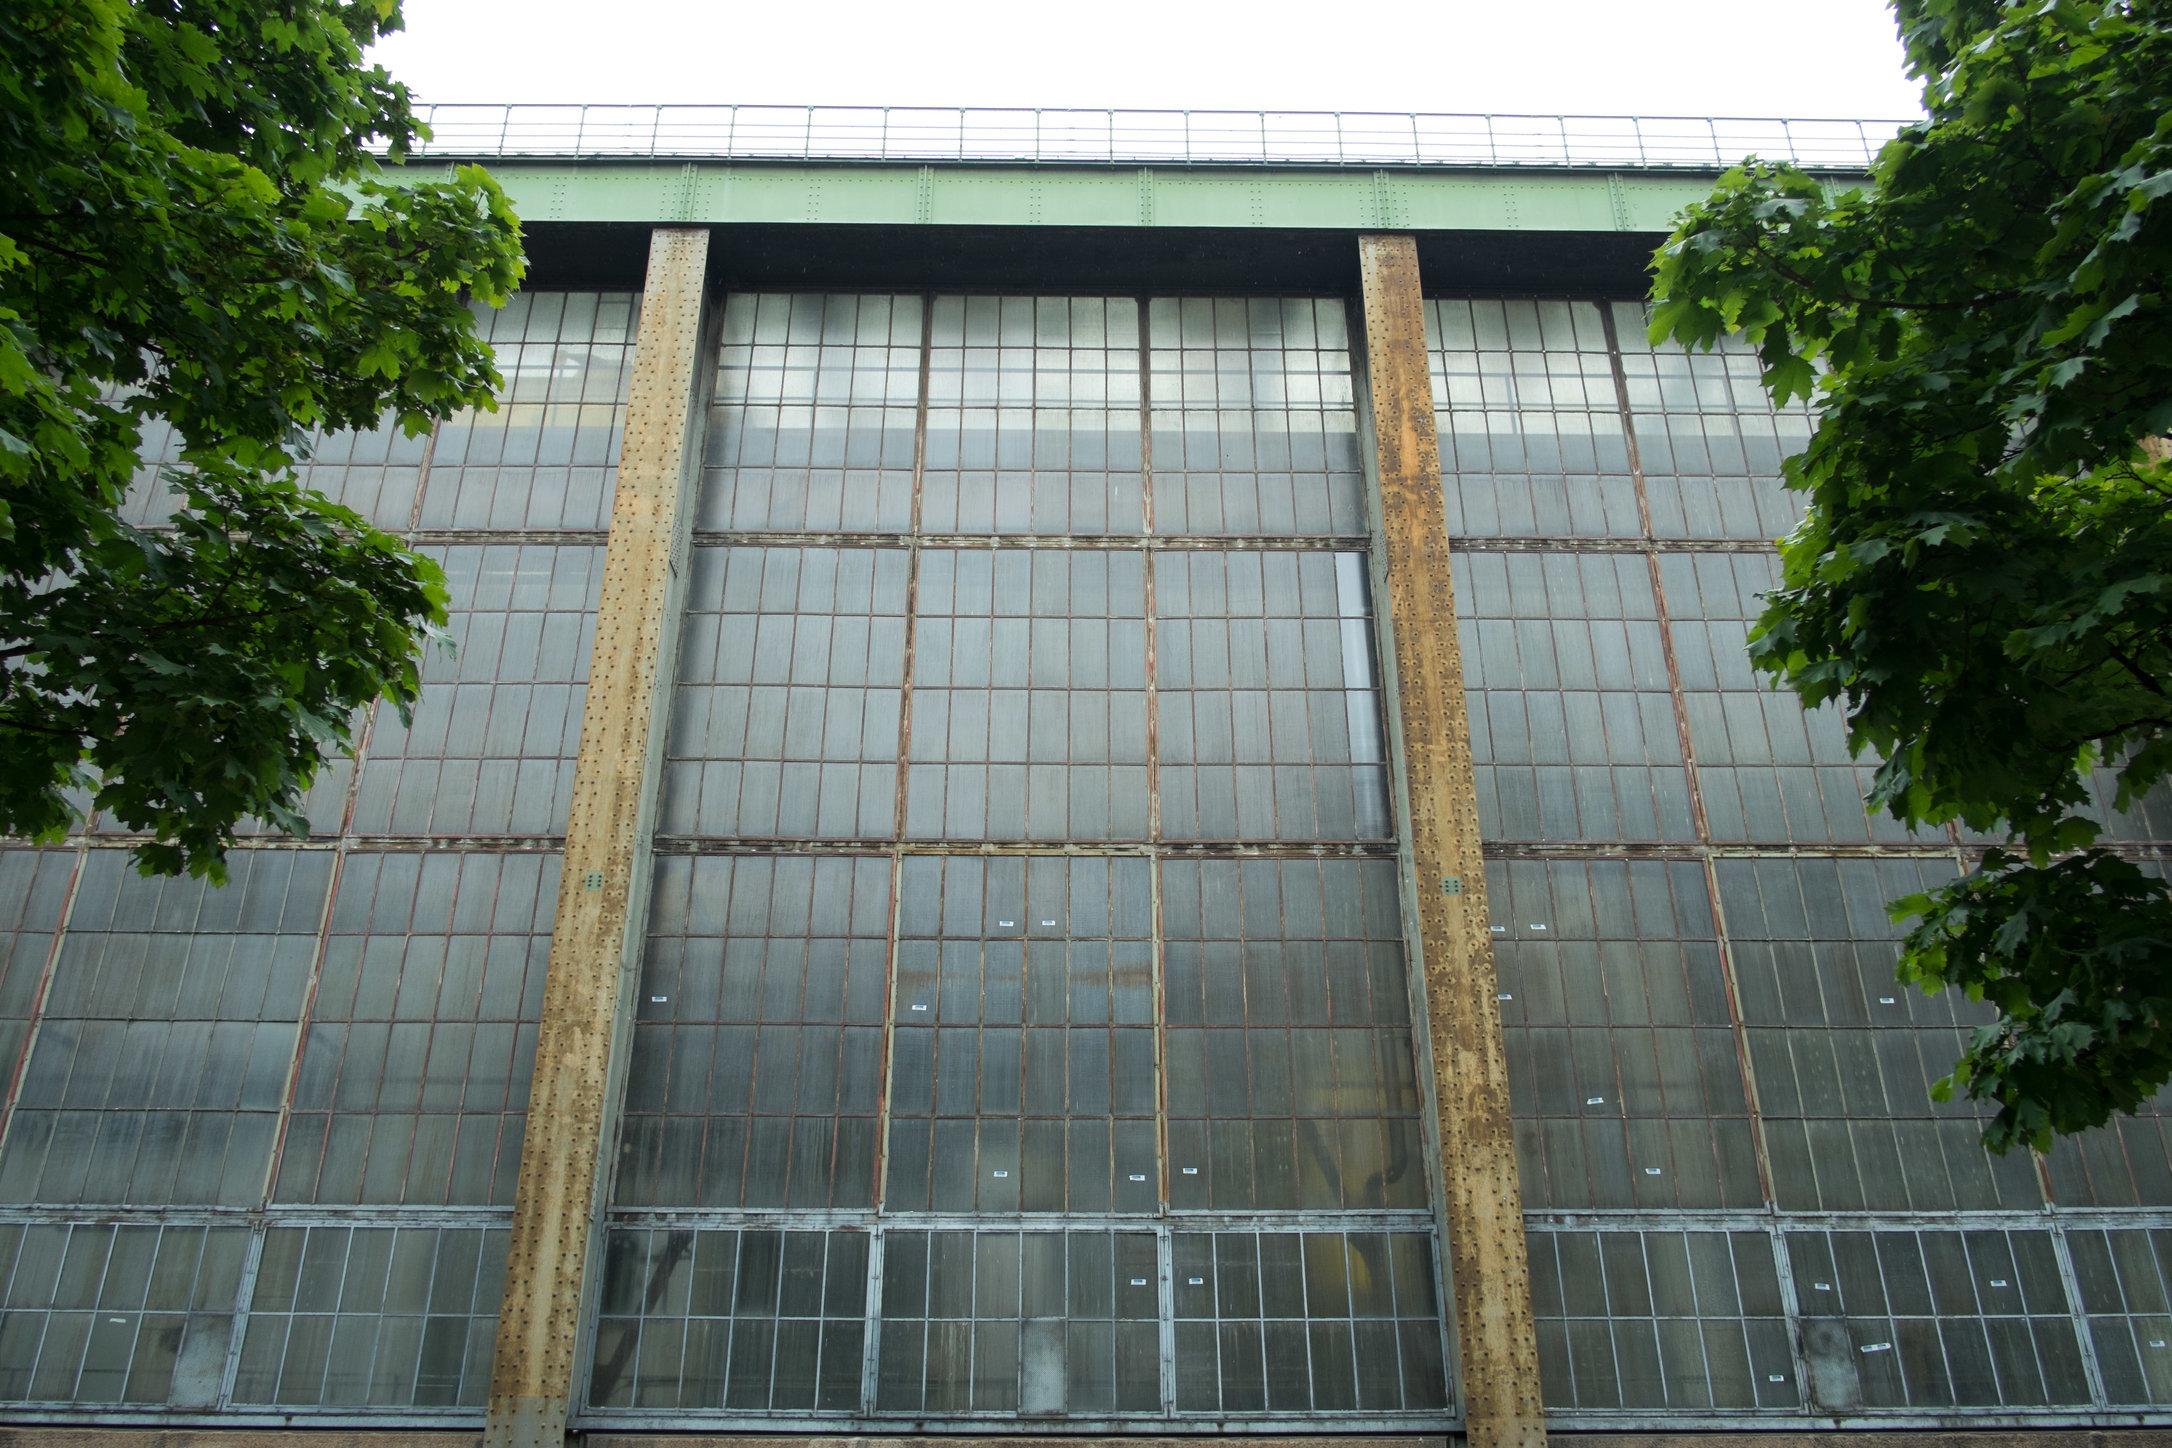 AEG TURBINE FACTORY |BERLIN